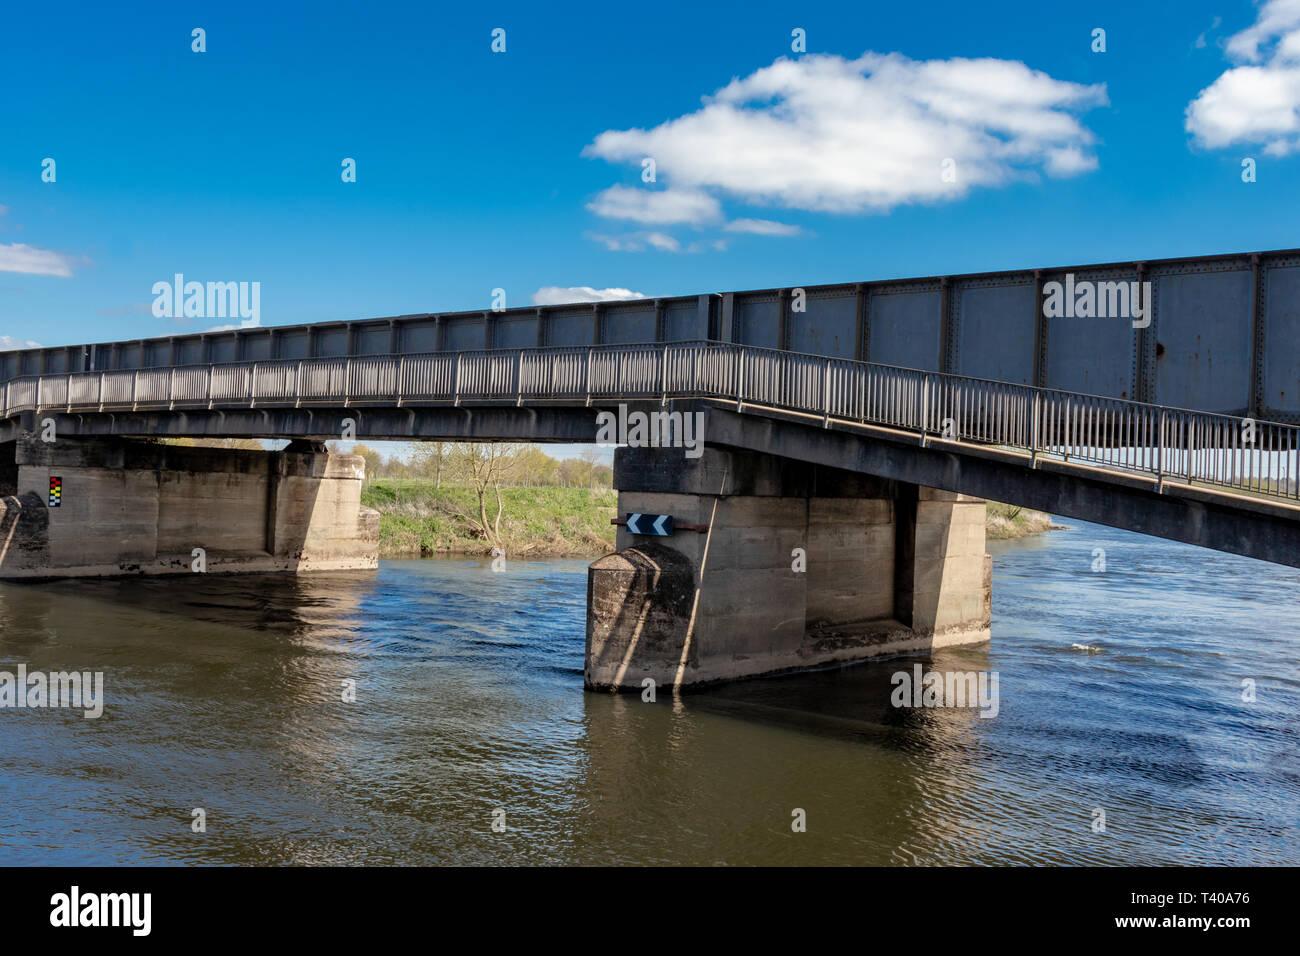 Trent and Mersey Canal ,Lock Gates and Railway Bridge near to Sawley Marina,Nottinghamshire England - Stock Image